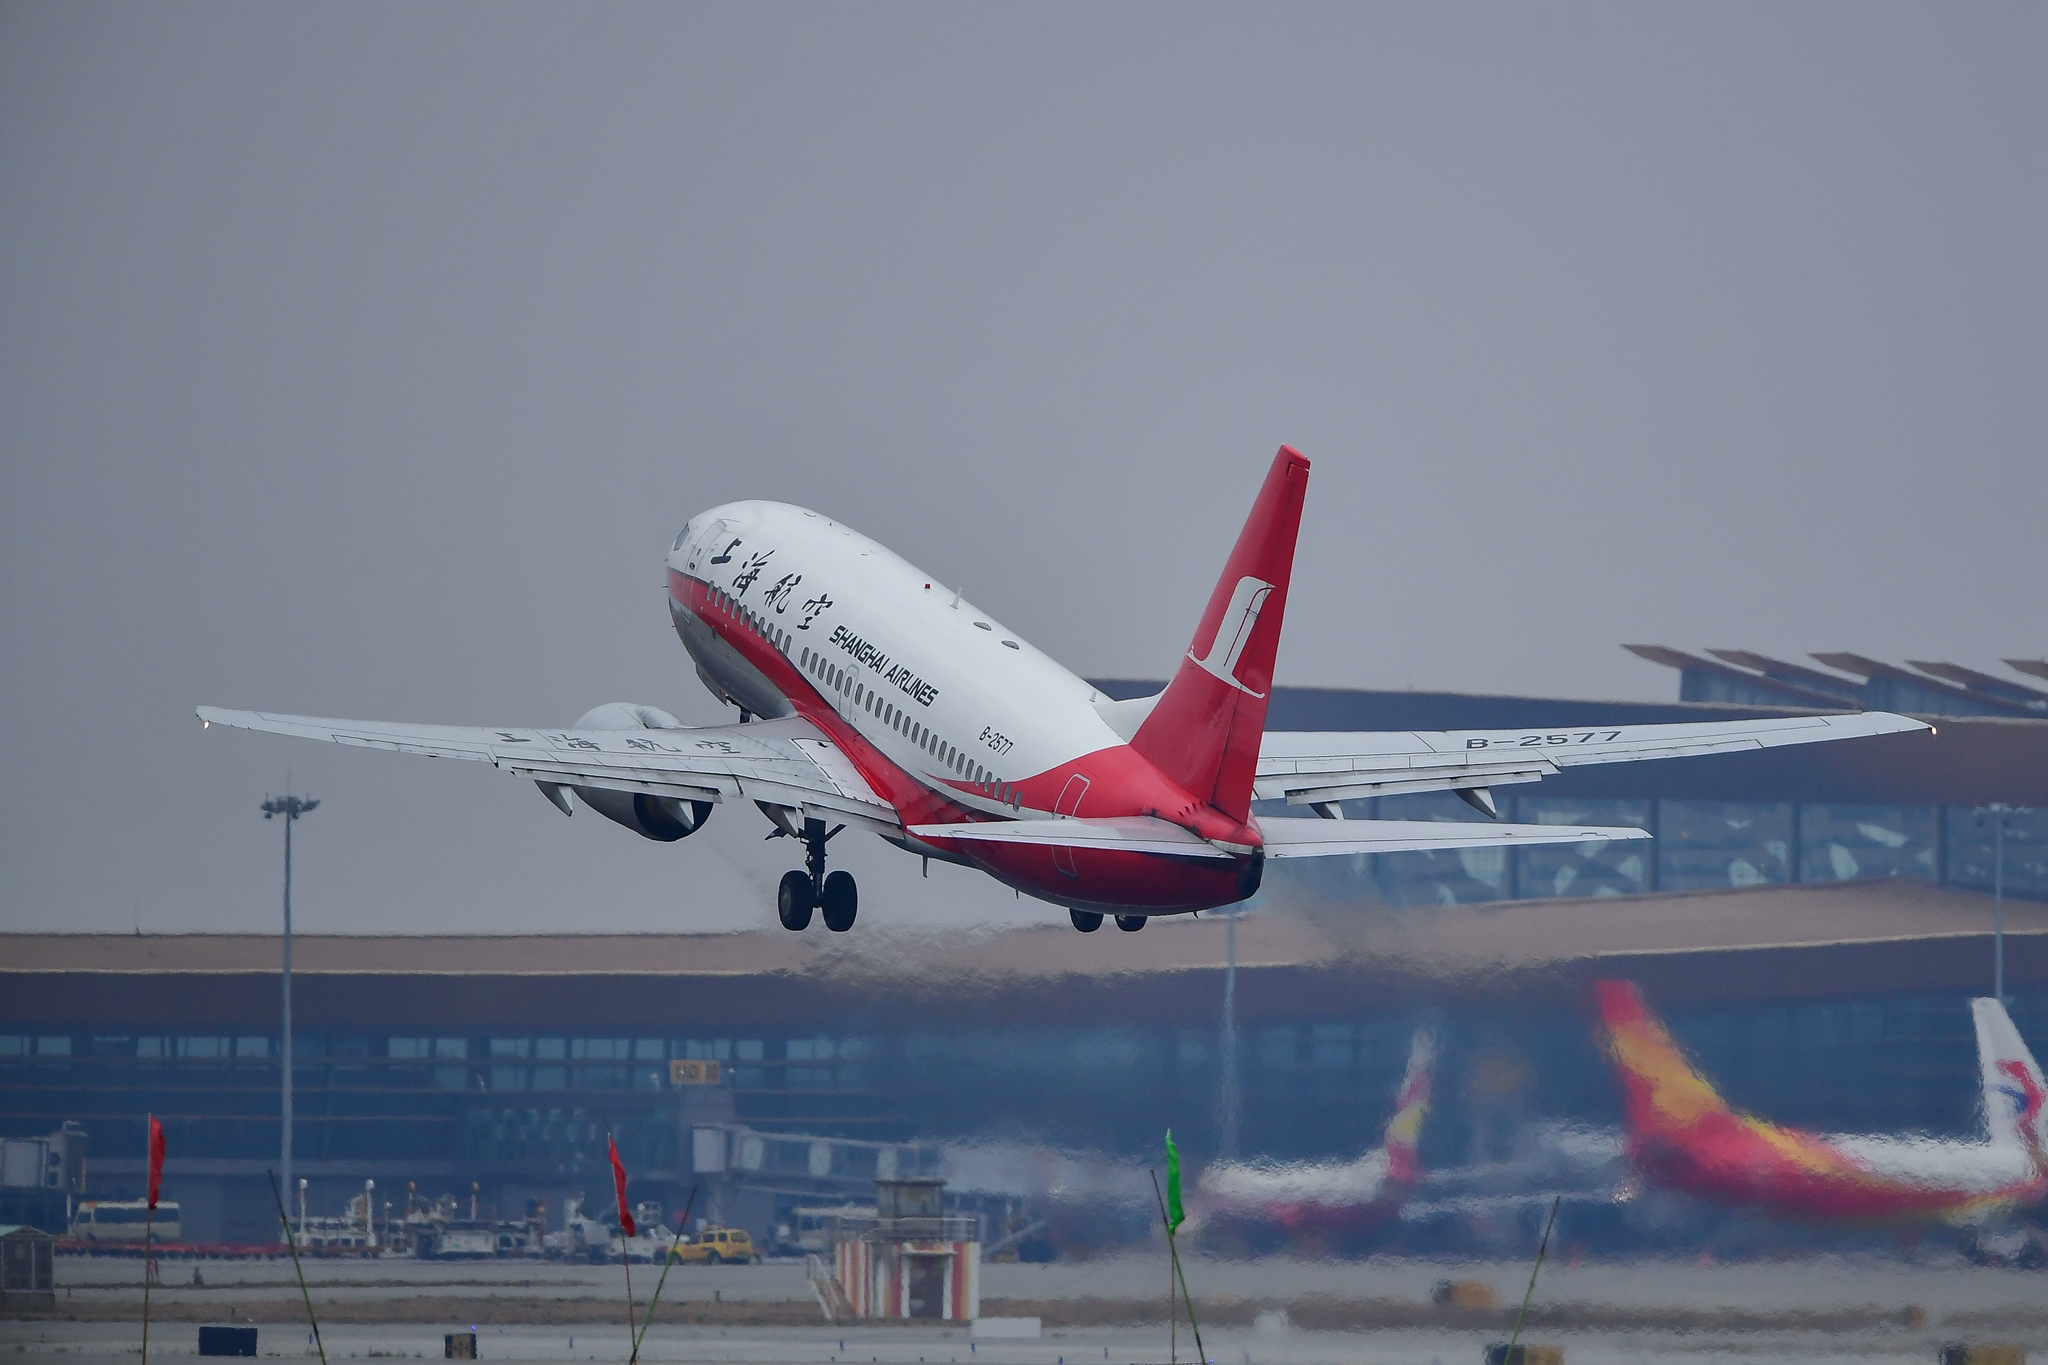 Re:[原创]KMG 庚子年初四再赴长水之约 都是似曾相识 都是熟悉的味道 BOEING 737-700 B-2577 中国昆明长水国际机场